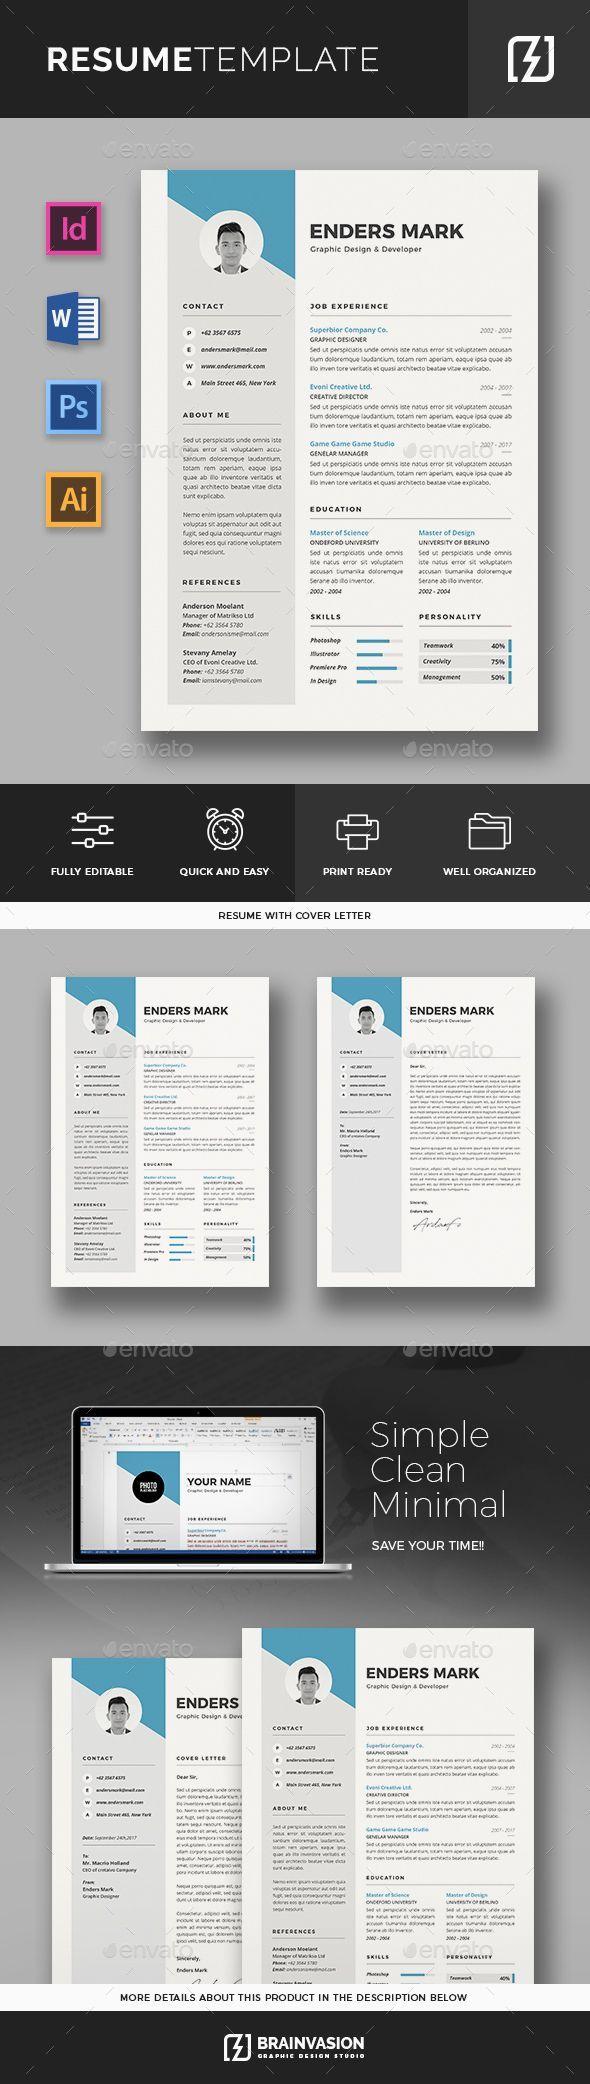 Resume Template 25 best Resume CV